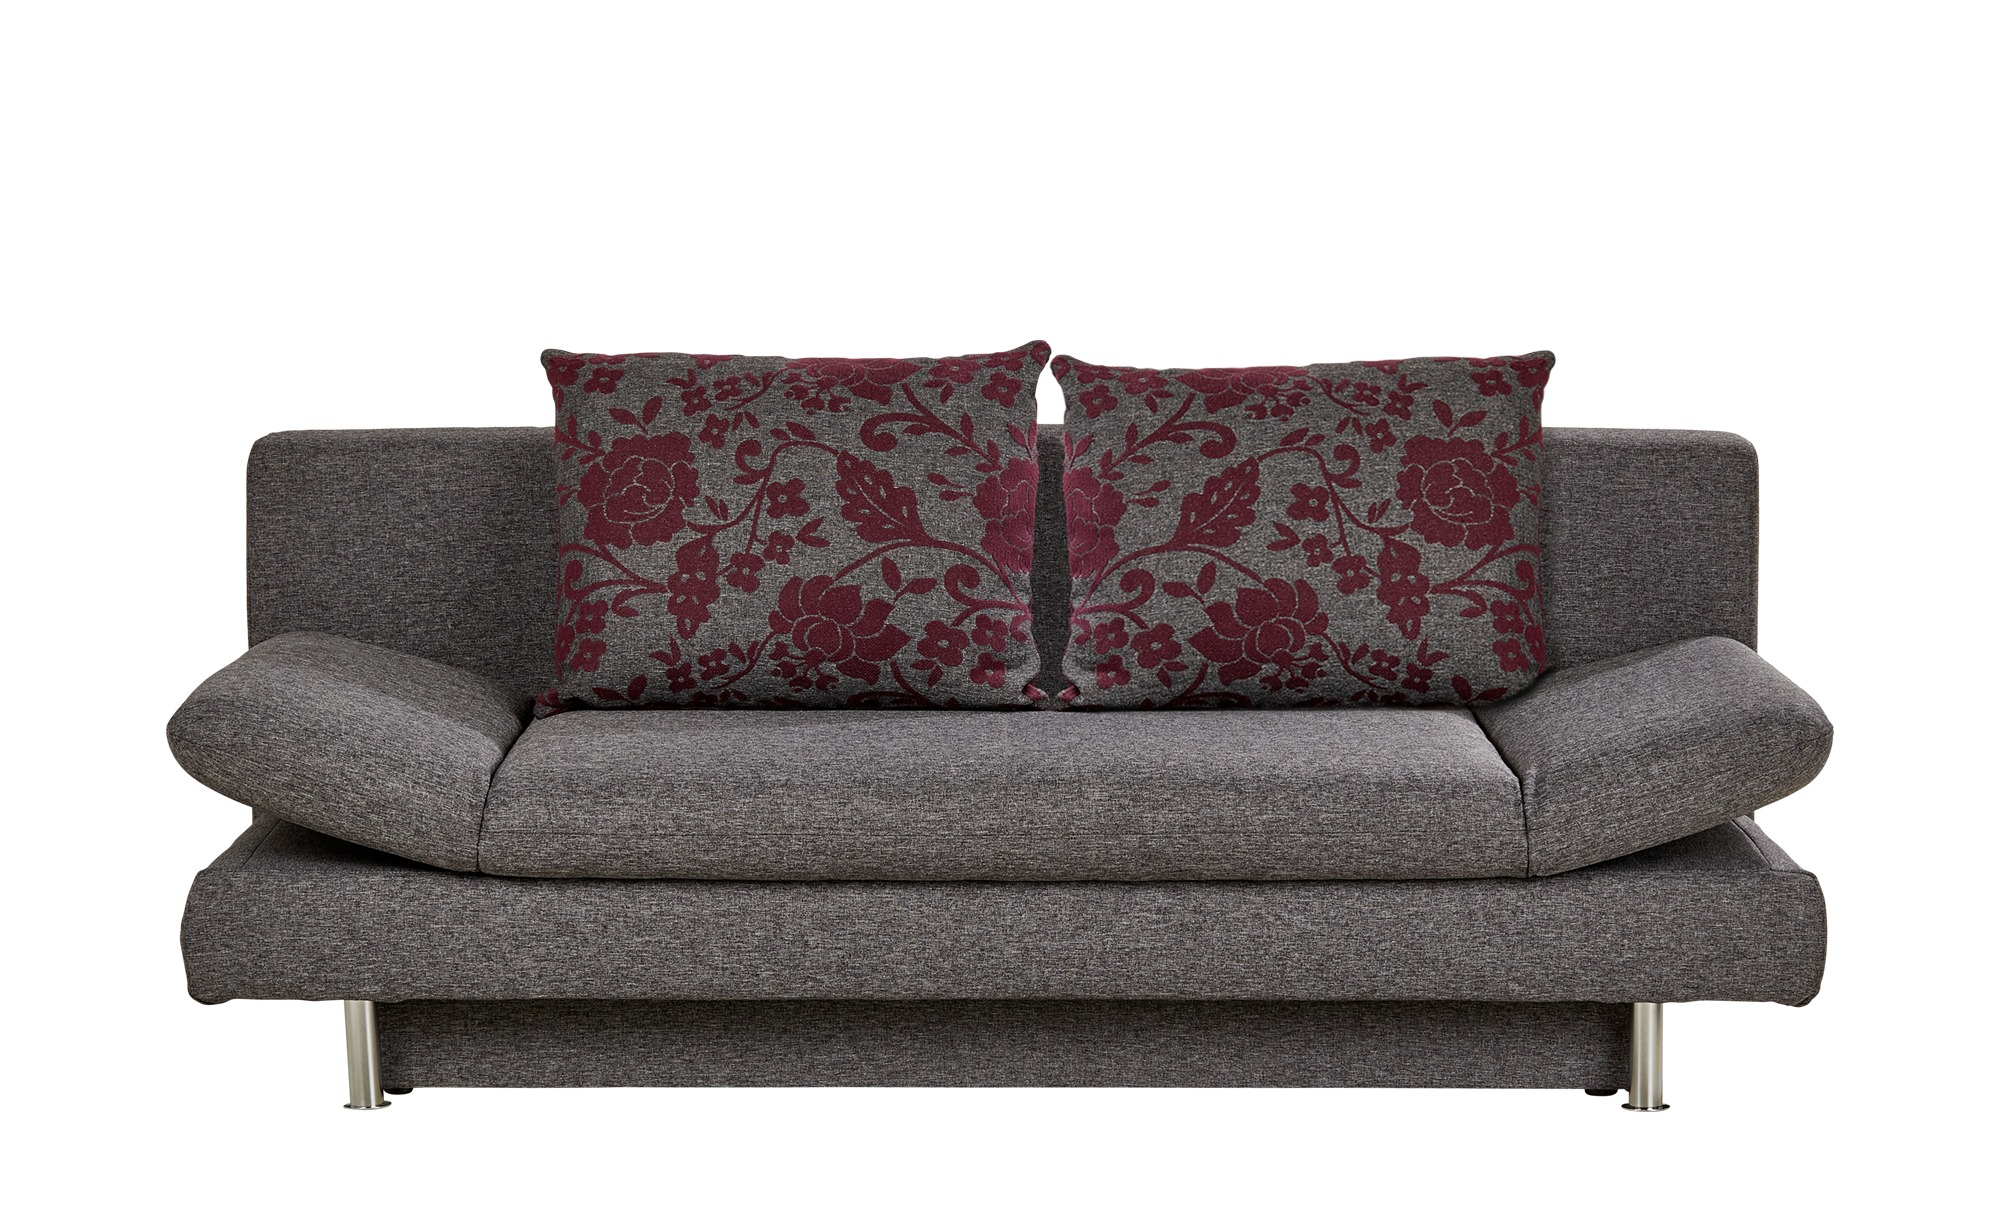 Design-Schlafsofa grau - Webstoff Olivia ¦ grau ¦ Maße (cm): B: 195 H: 87 T: 93 Polstermöbel > Sofas > 2-Sitzer - Höffner